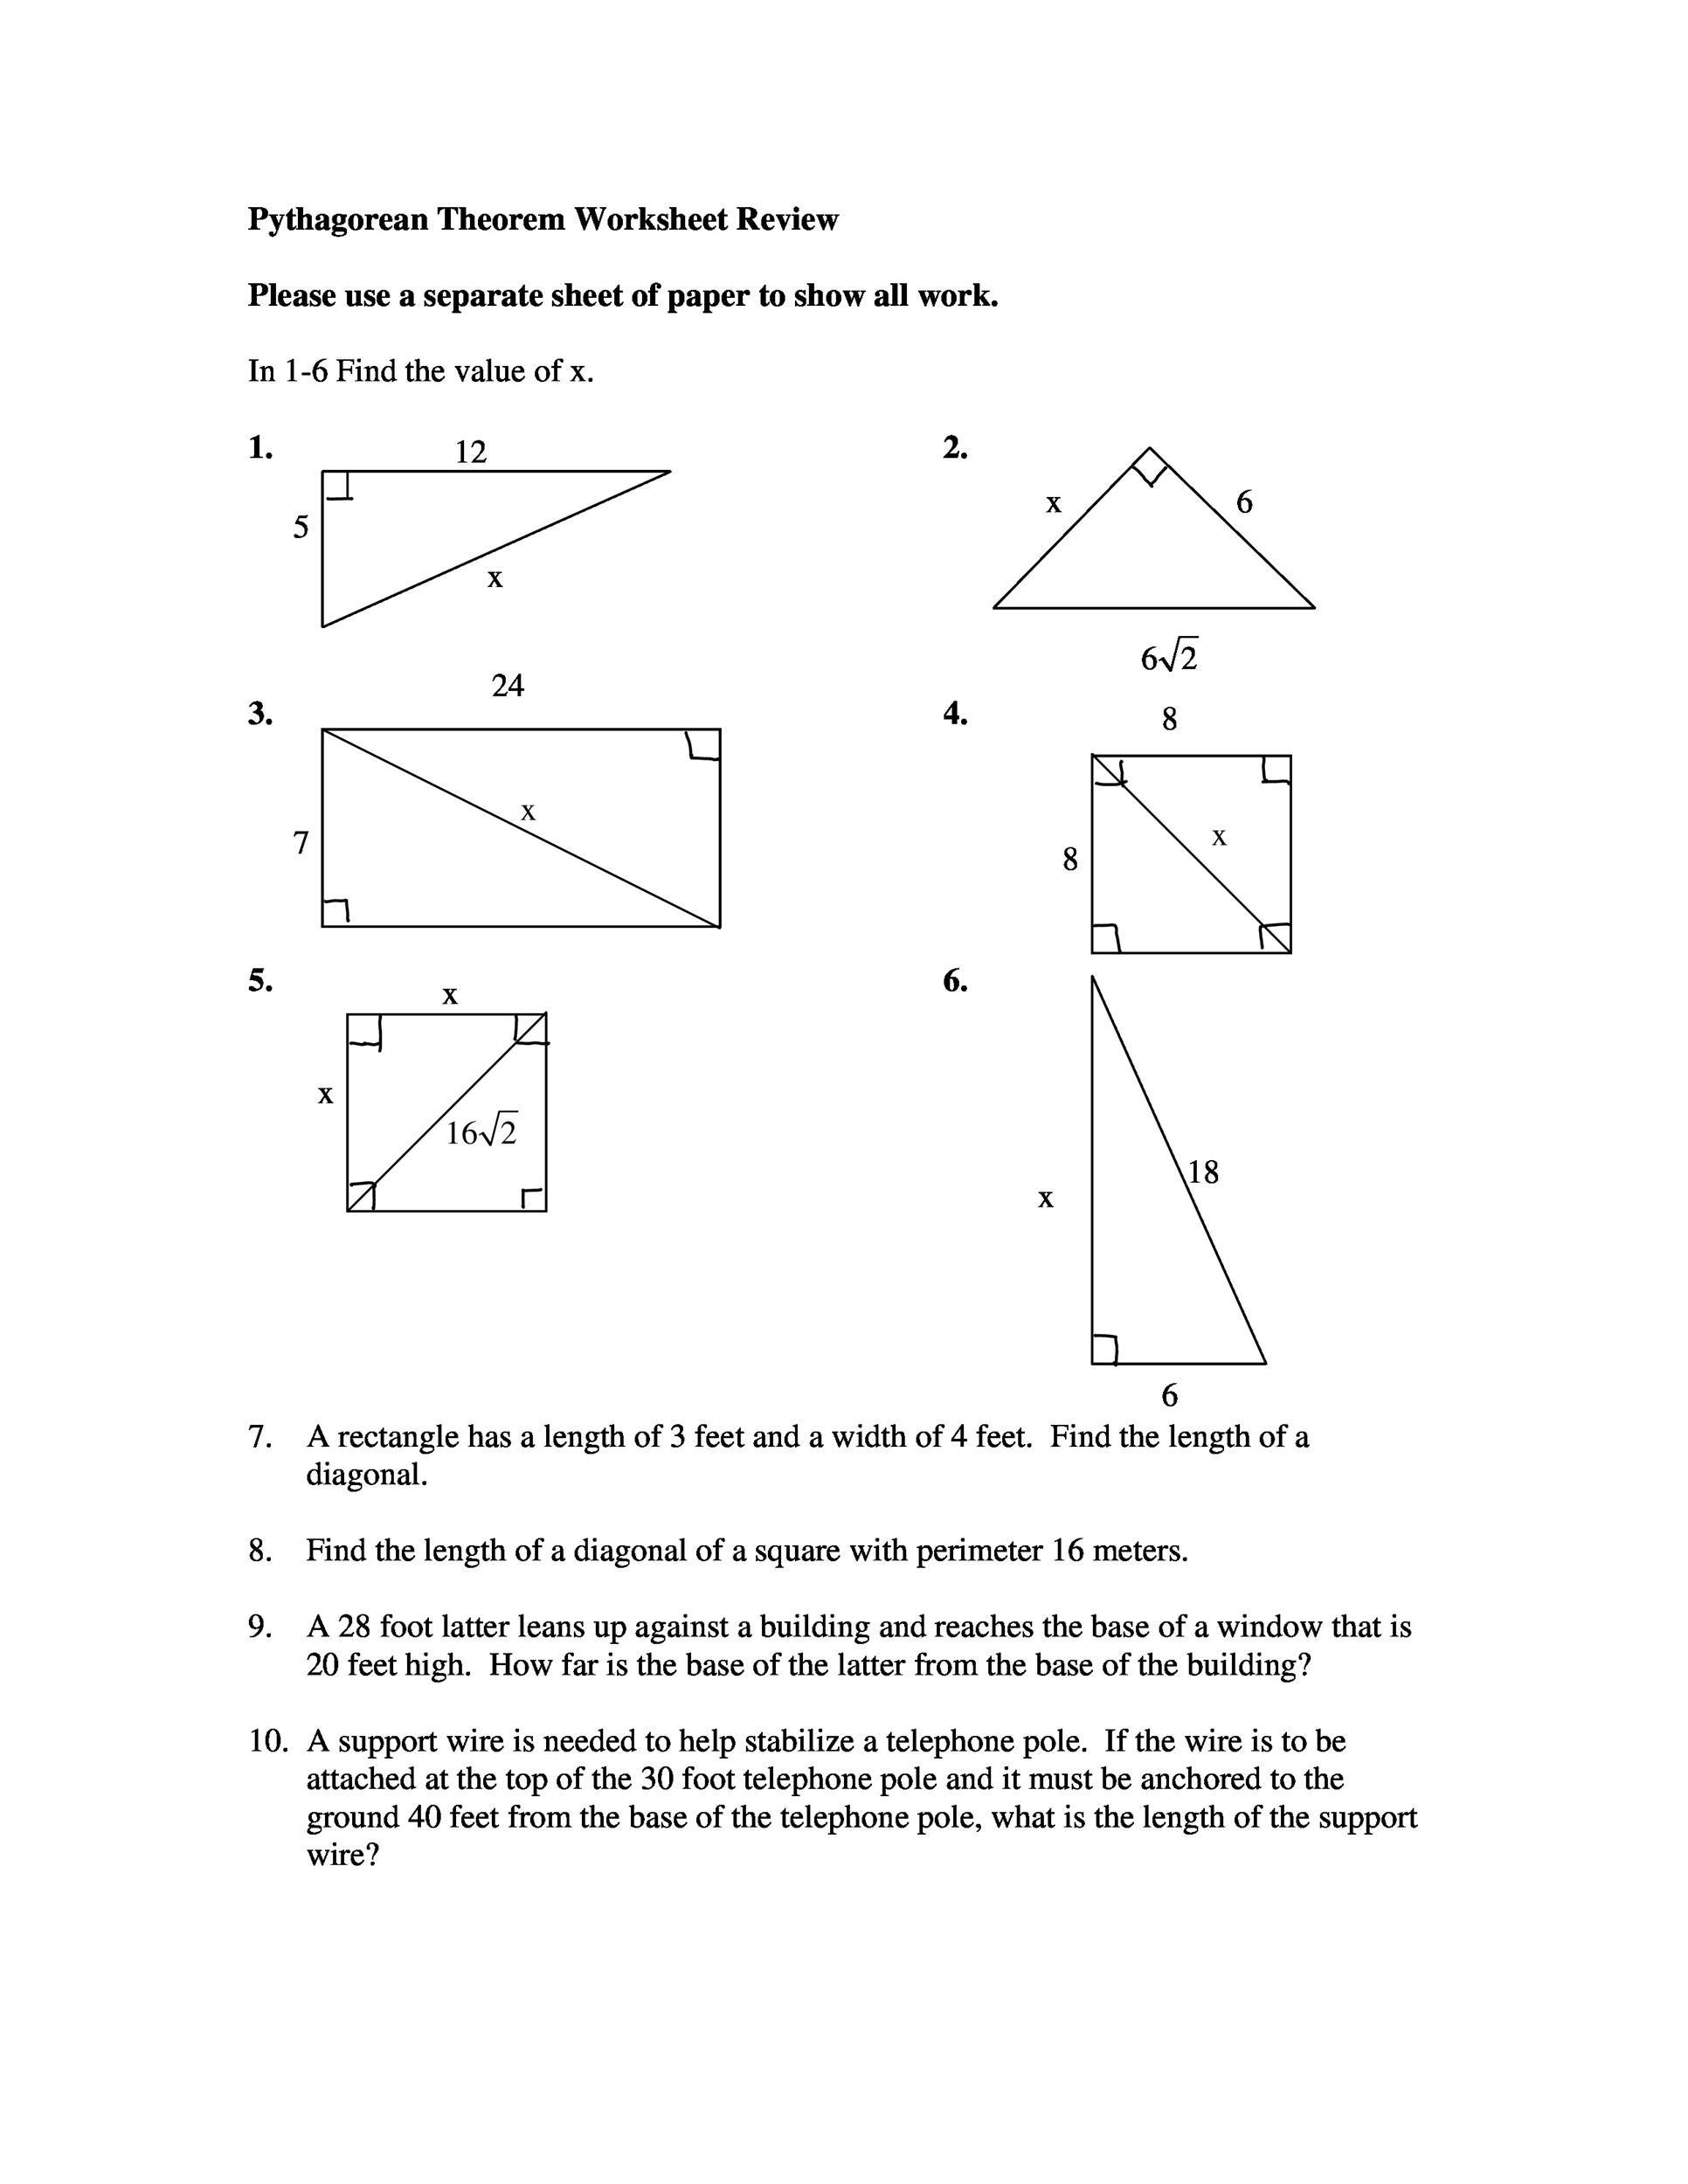 Pythagoras theorem Worksheet with Answers Pythagorean theorem Perimeter Worksheet